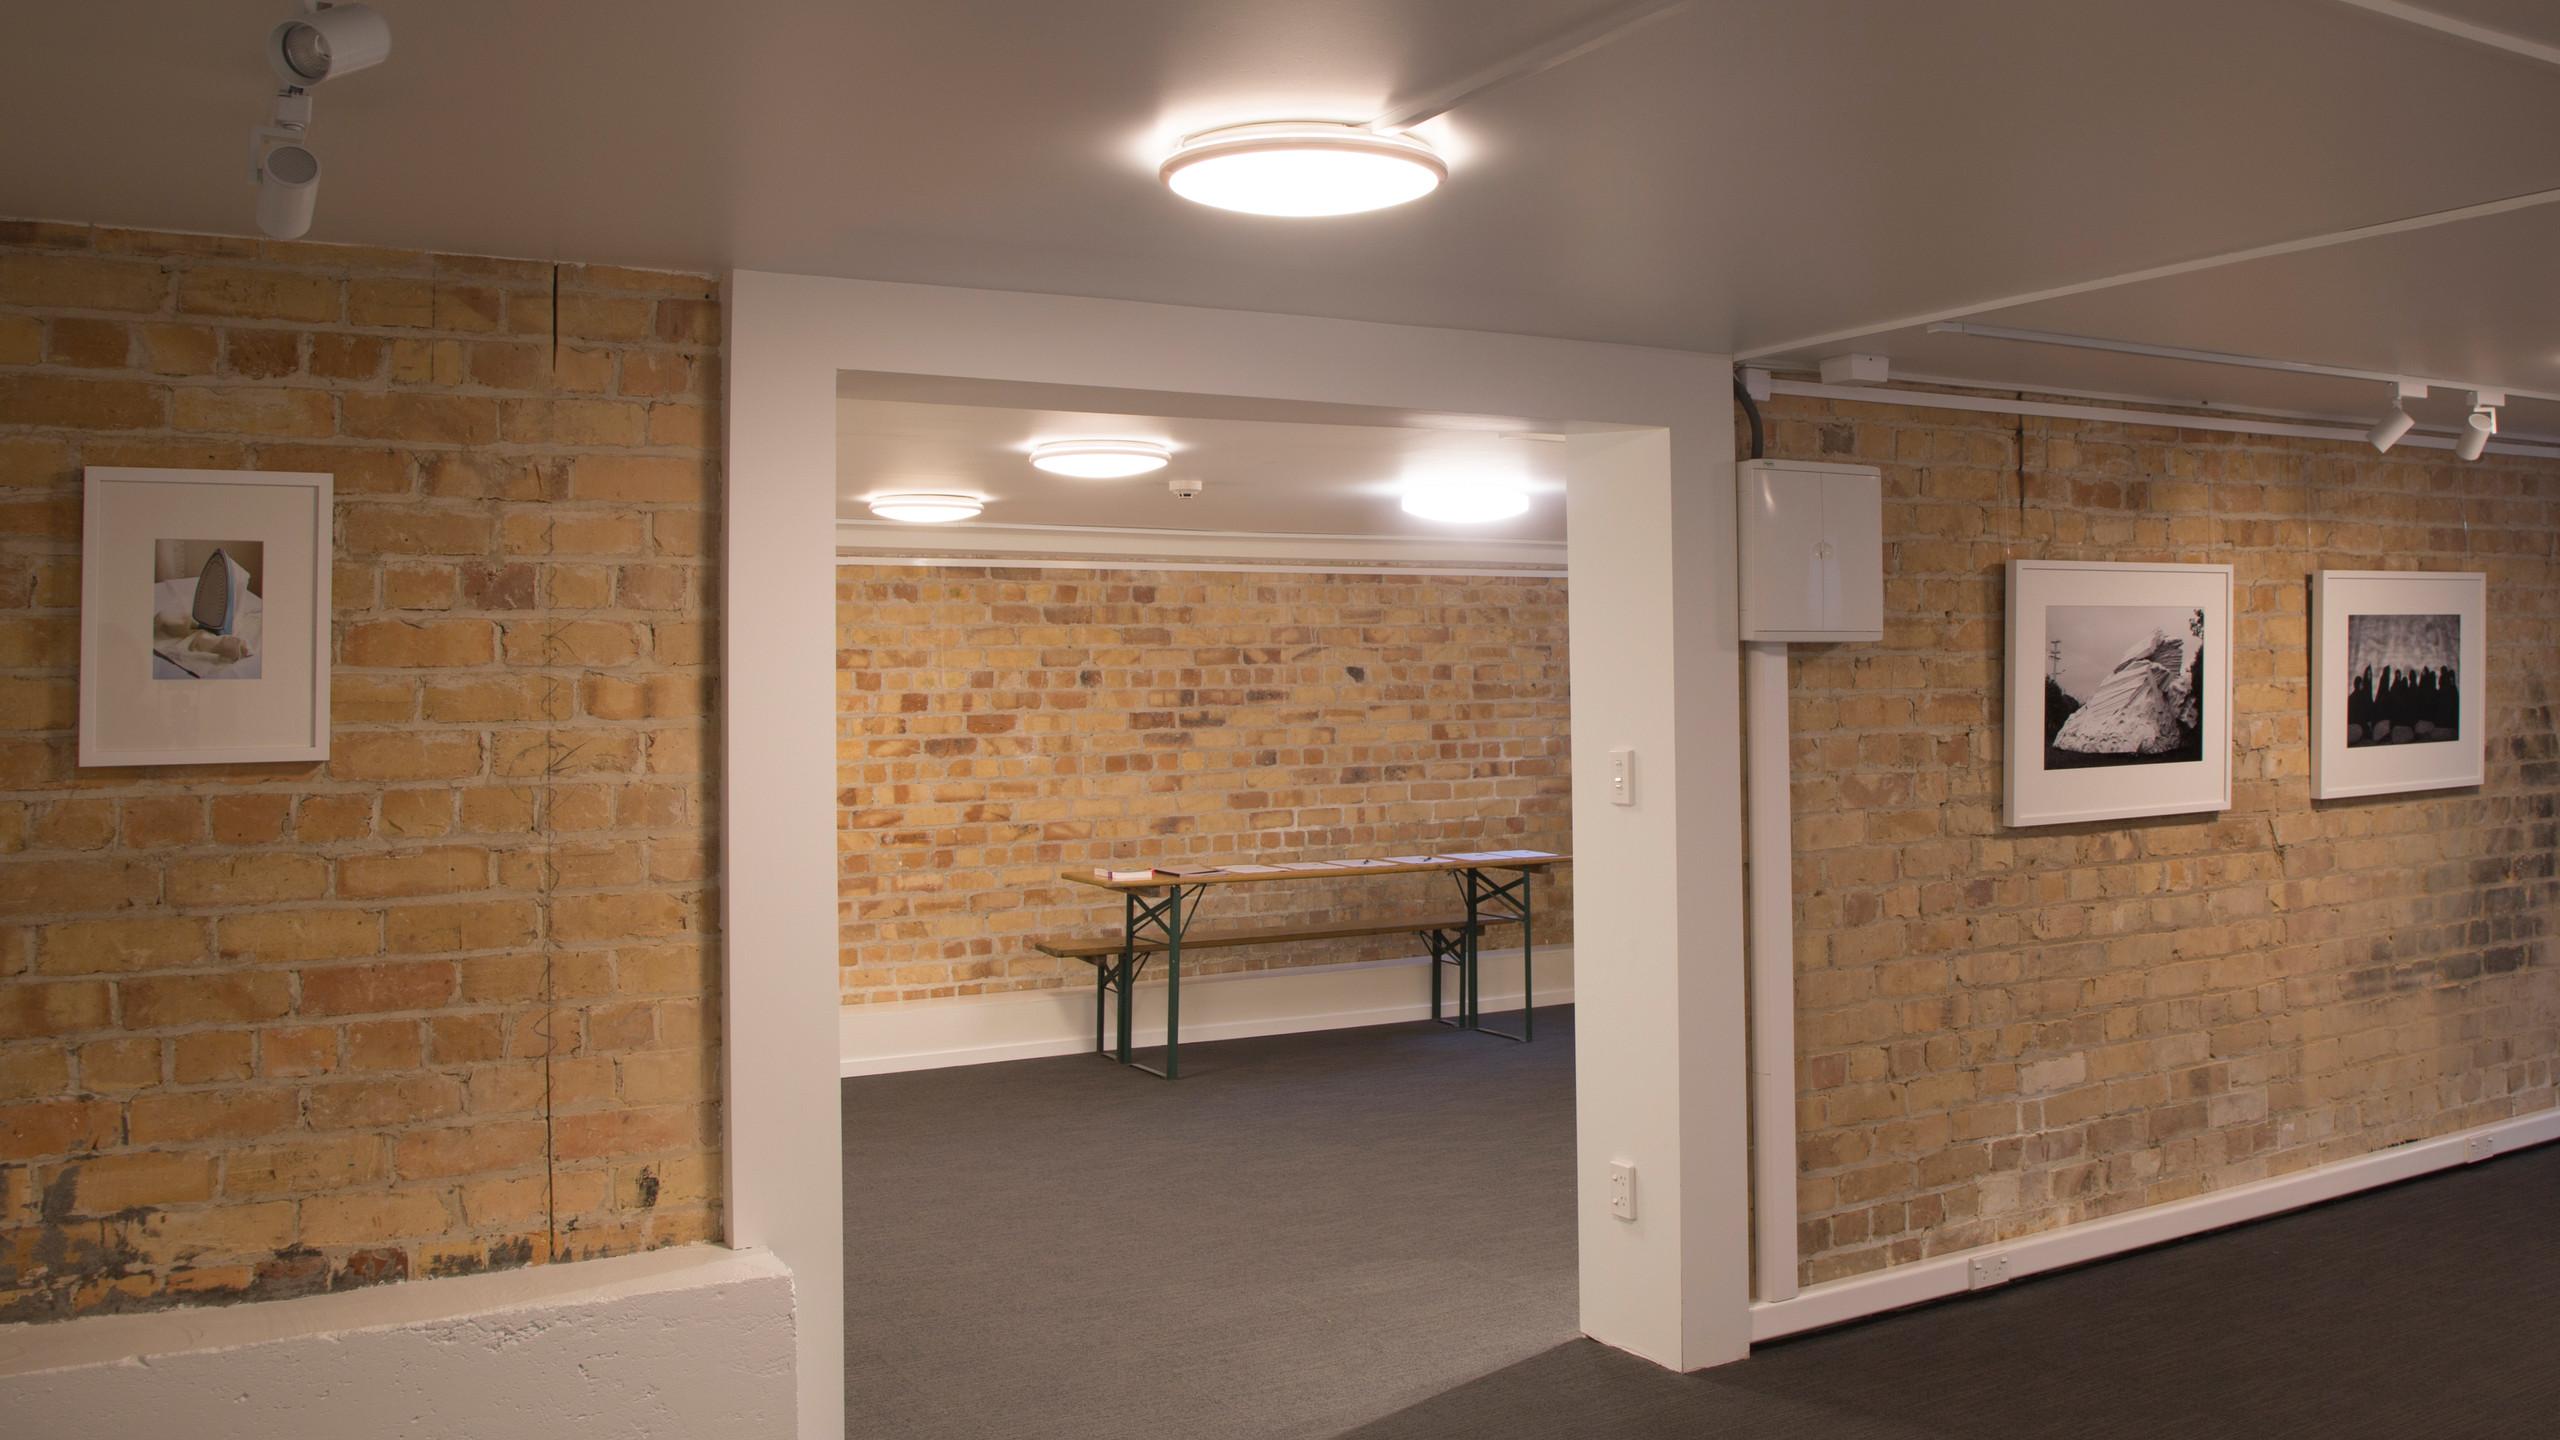 Ground level gallery